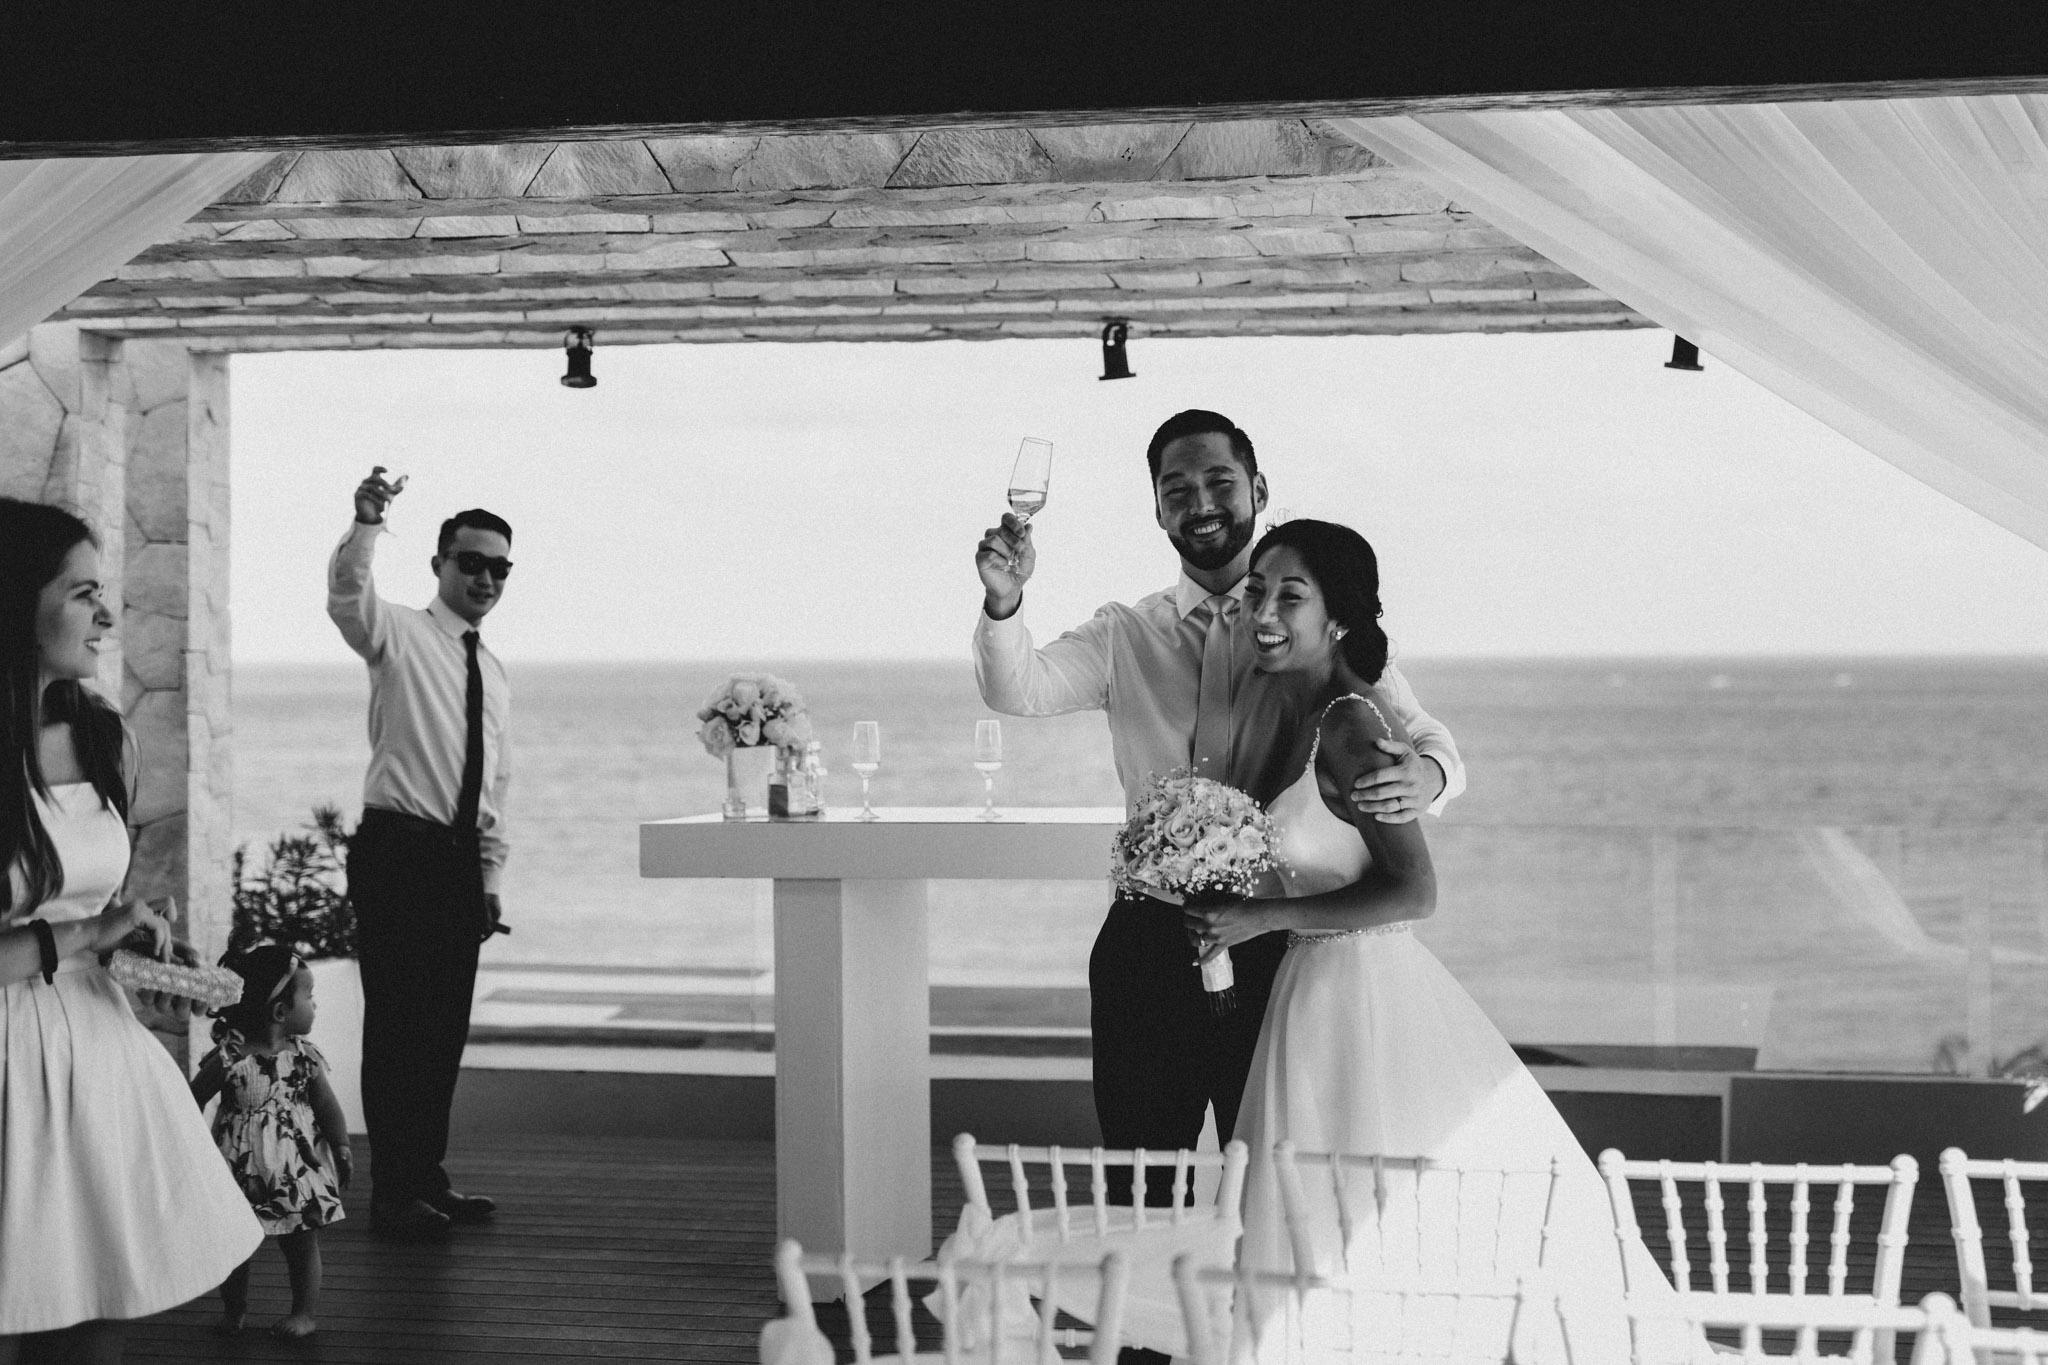 Cancun Mexico Wedding - bride and groom speech